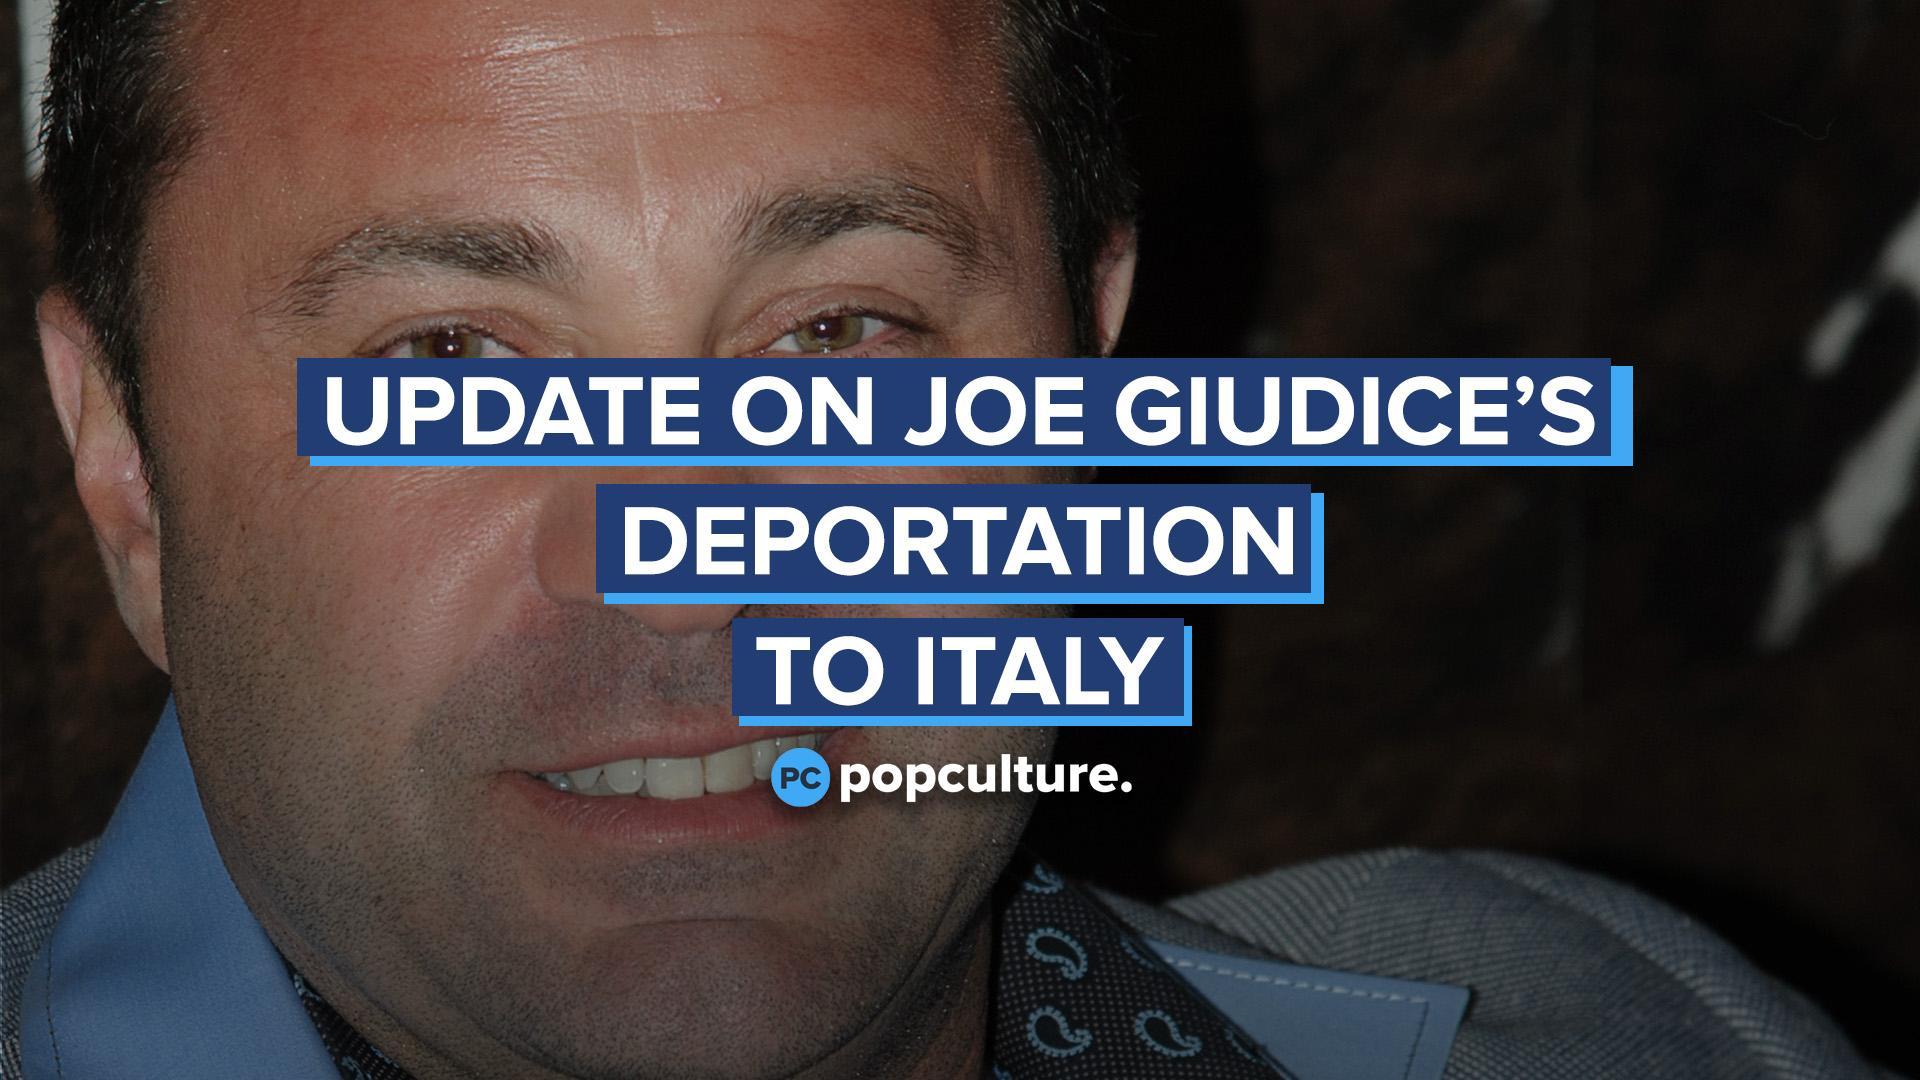 Update on Joe Giudice's Deportation to Italy screen capture